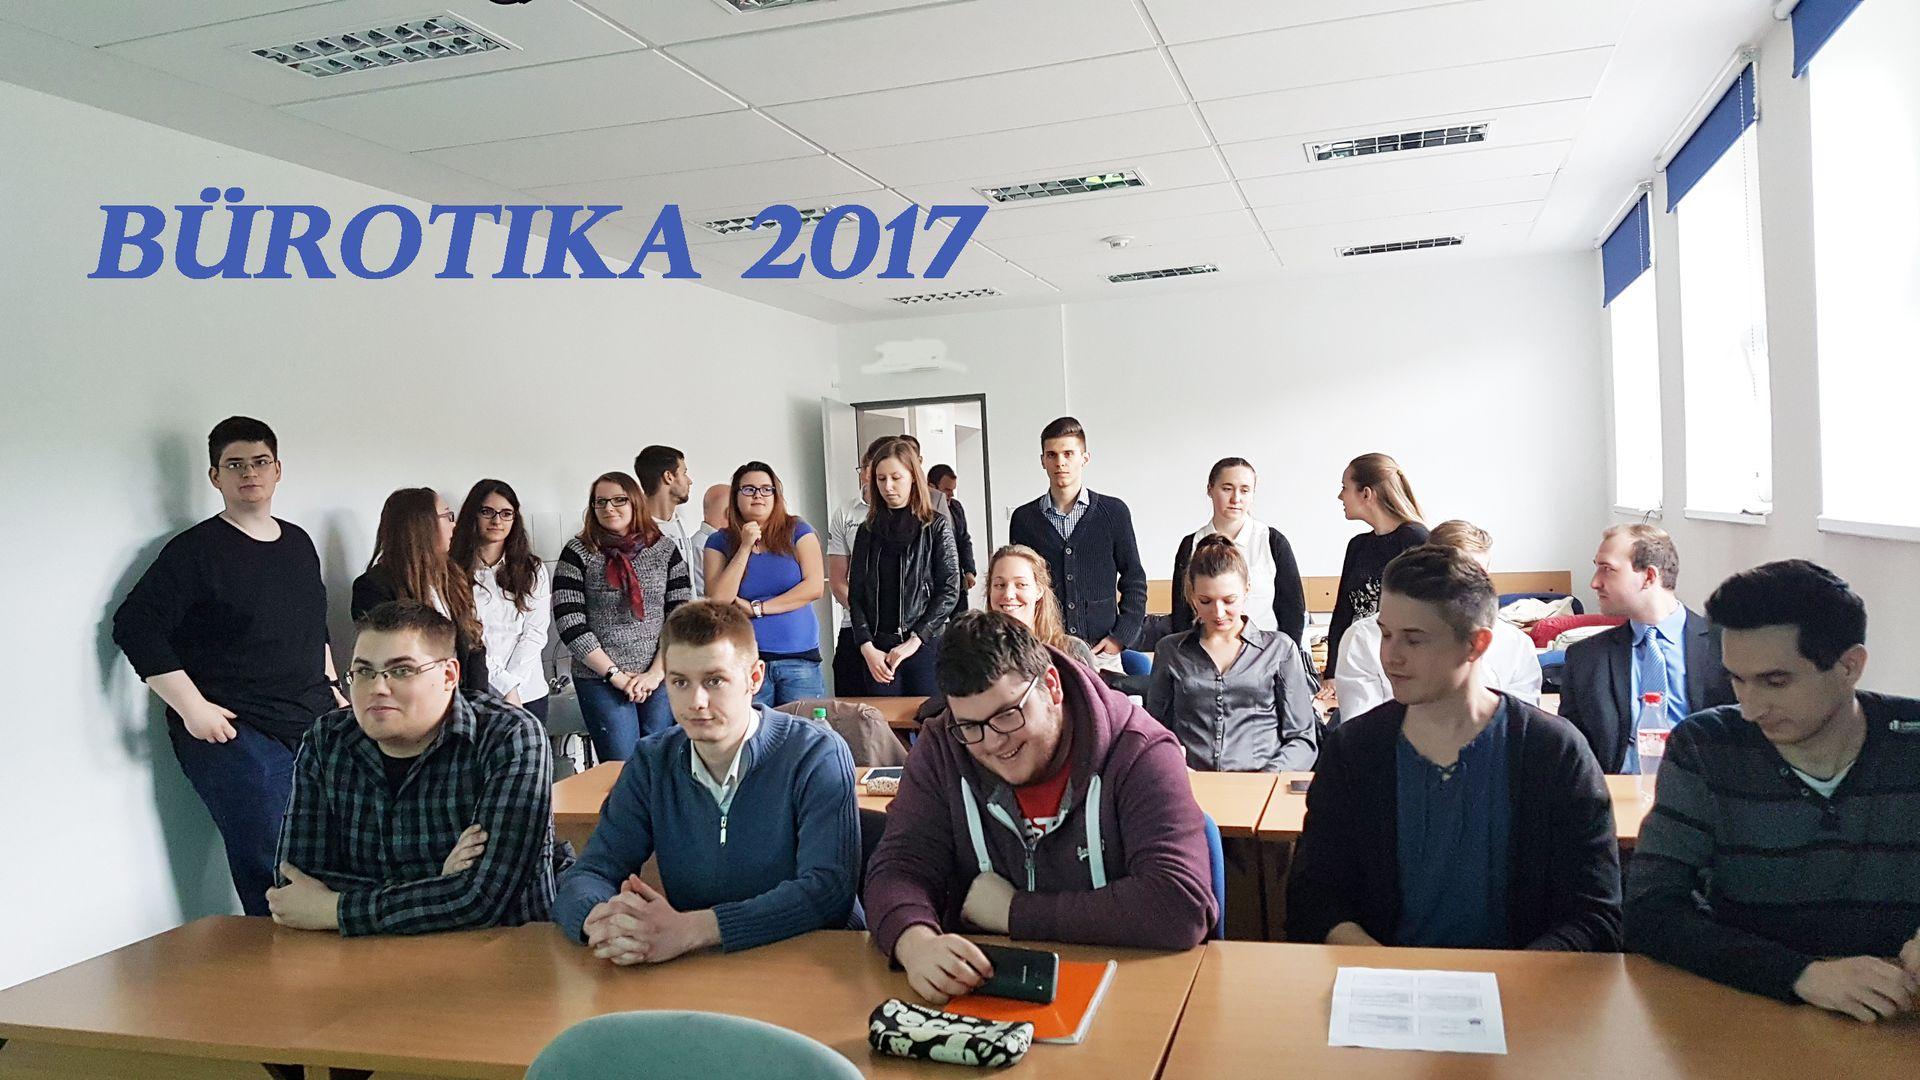 rsFHD_burotika_2017_3.jpg